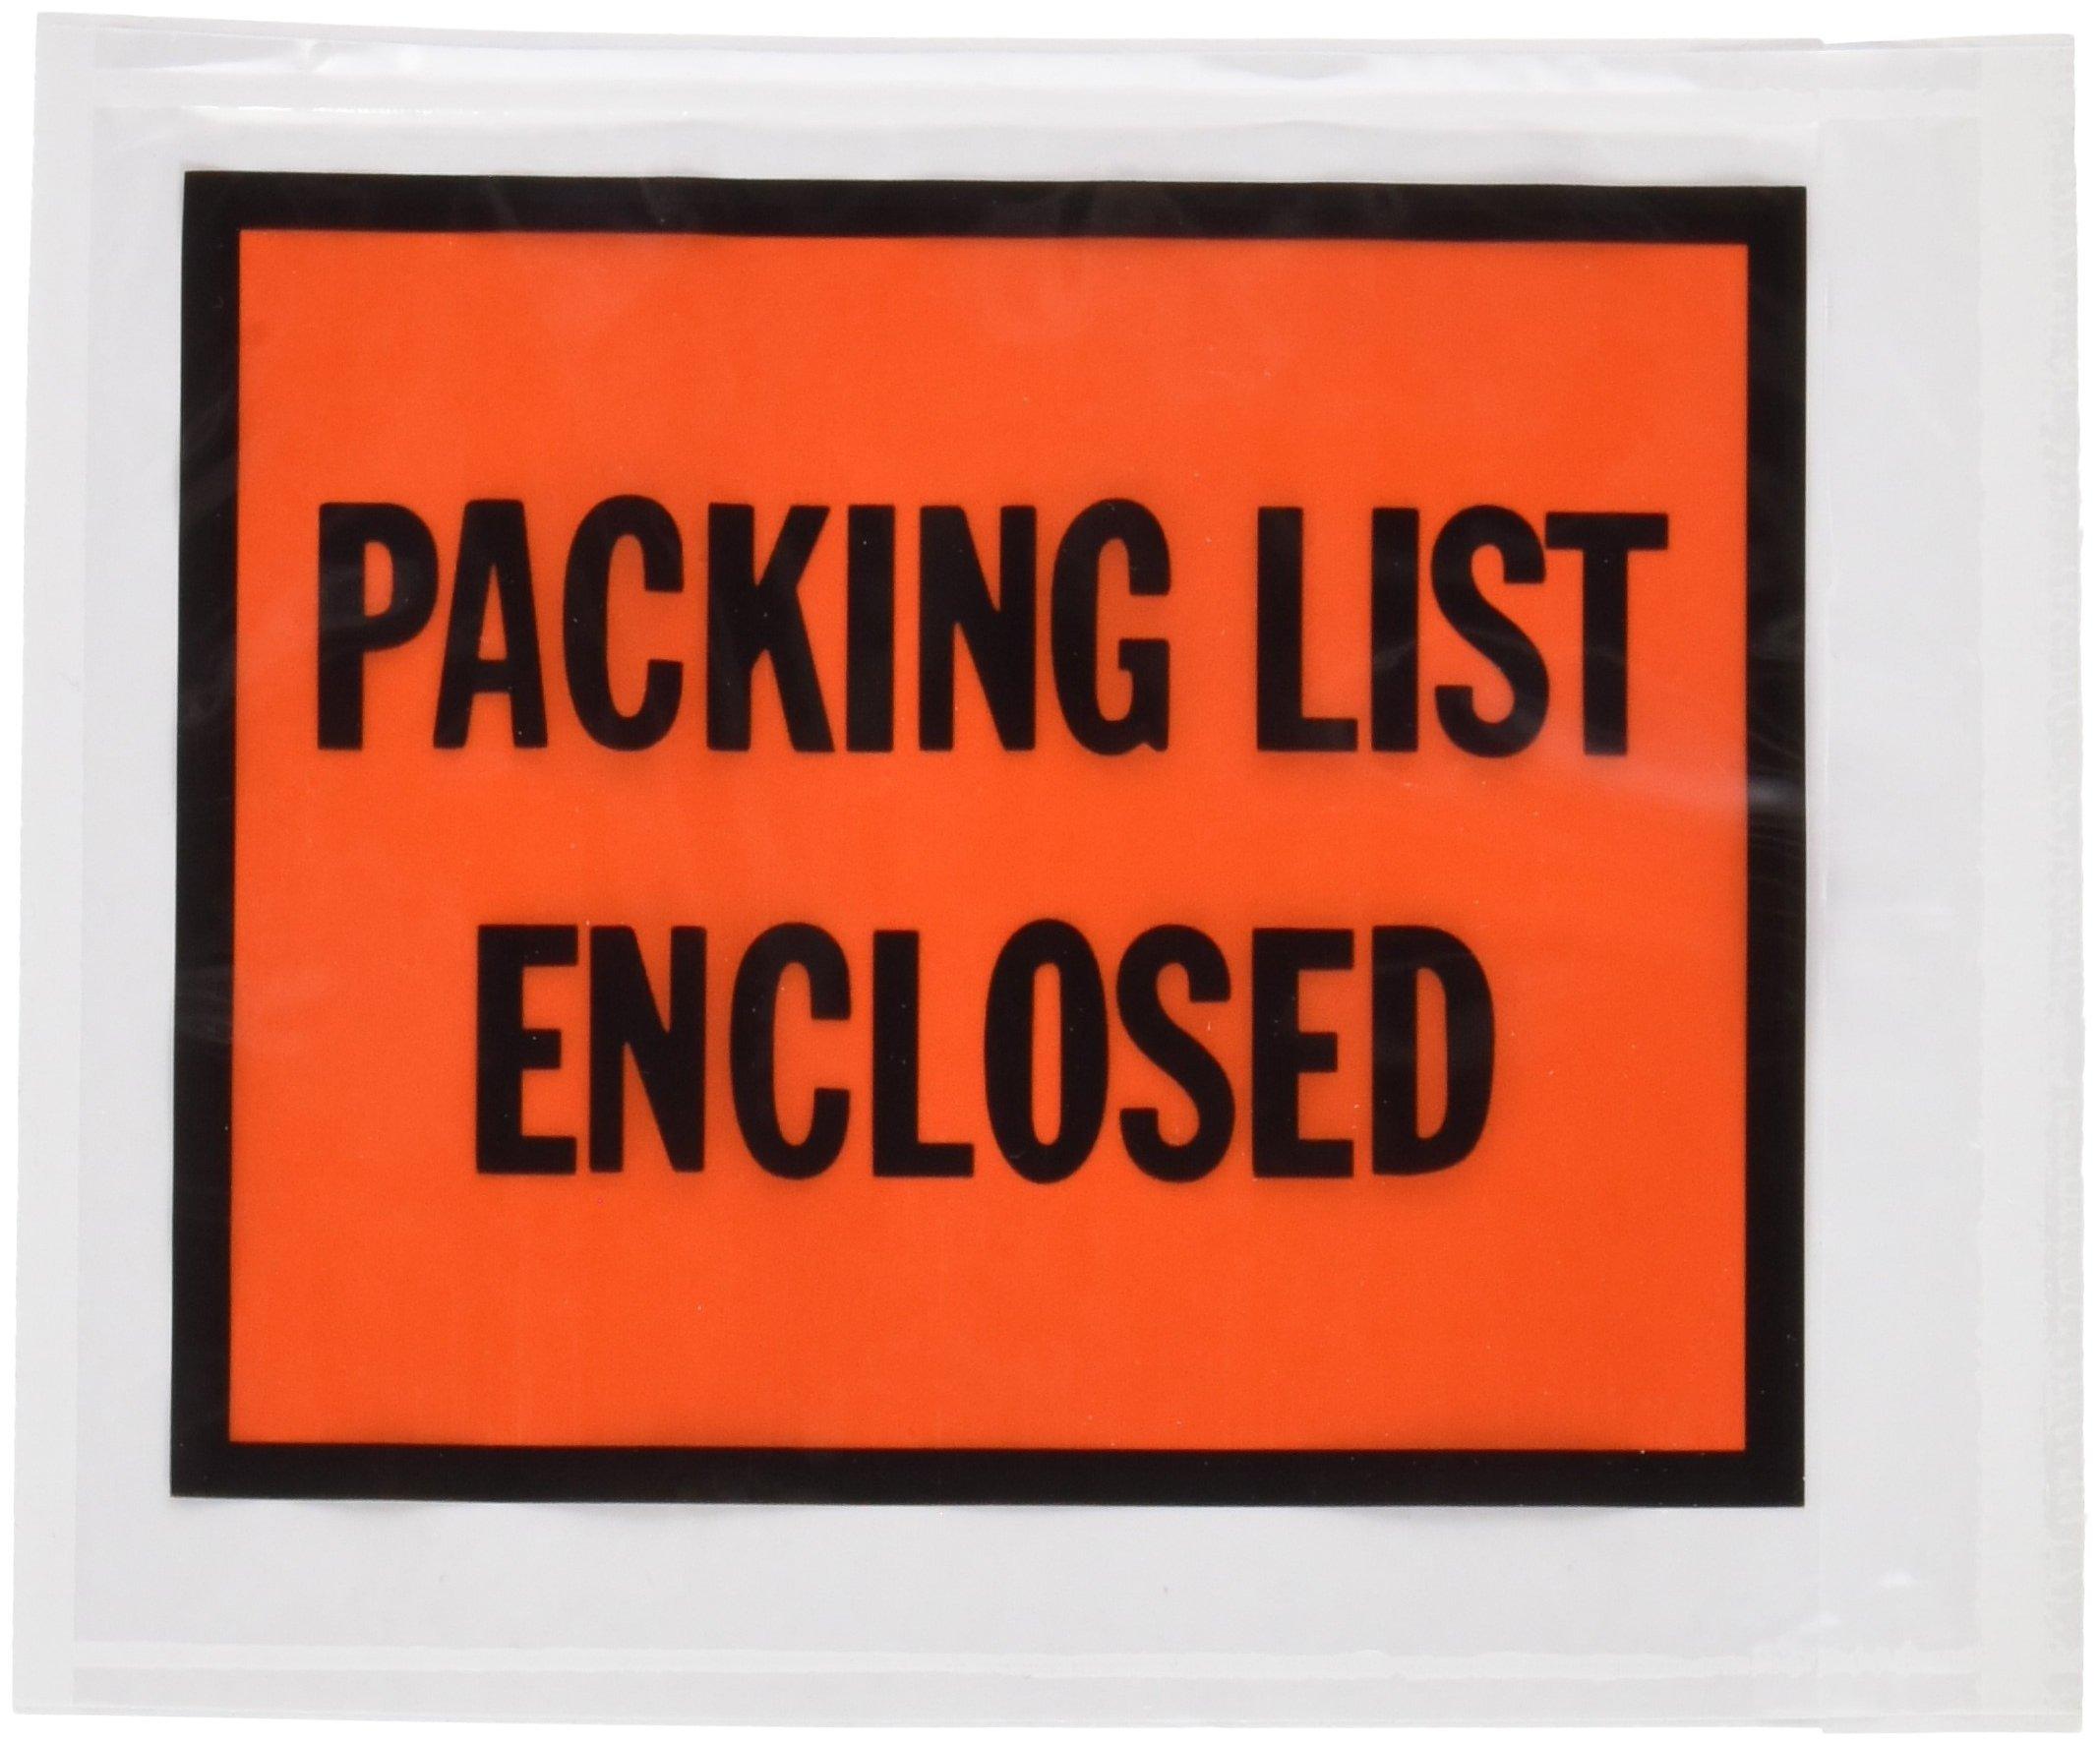 Quality Park 46895 Full-print front self-adhesive packing list envelopes, bright orange, 100/box